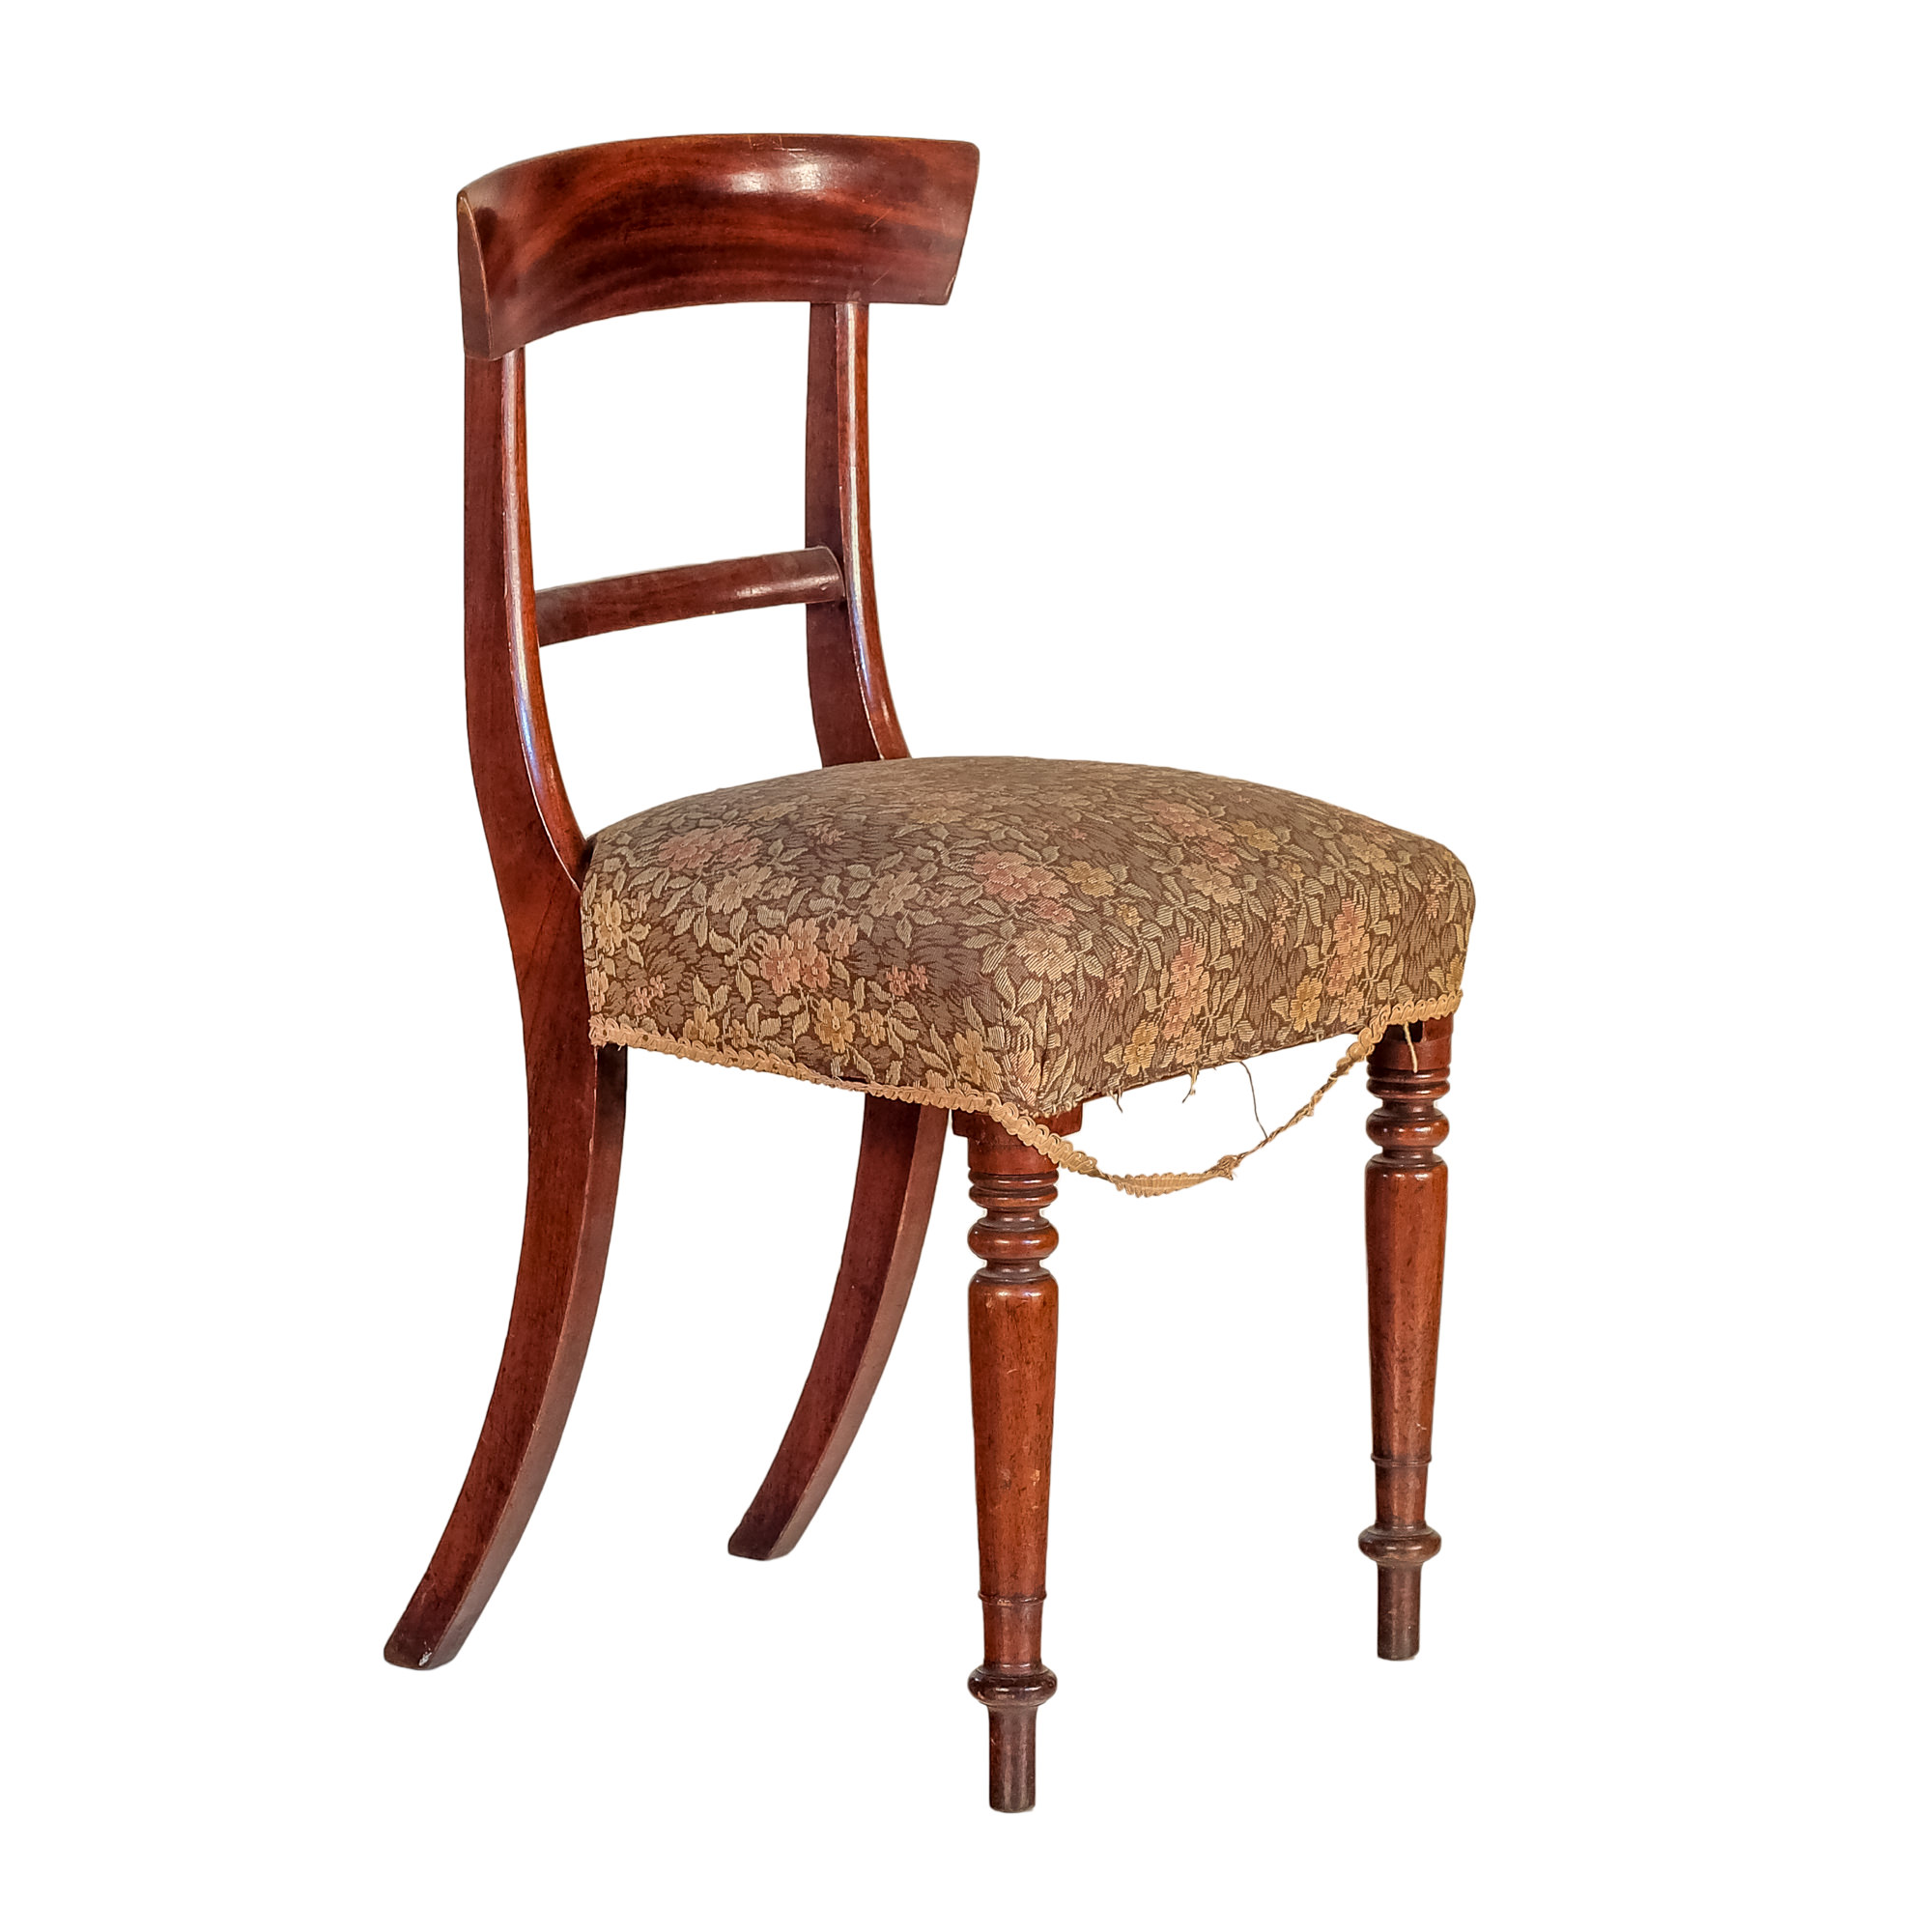 'Victorian Mahogany Dining Chair Circa 1870'